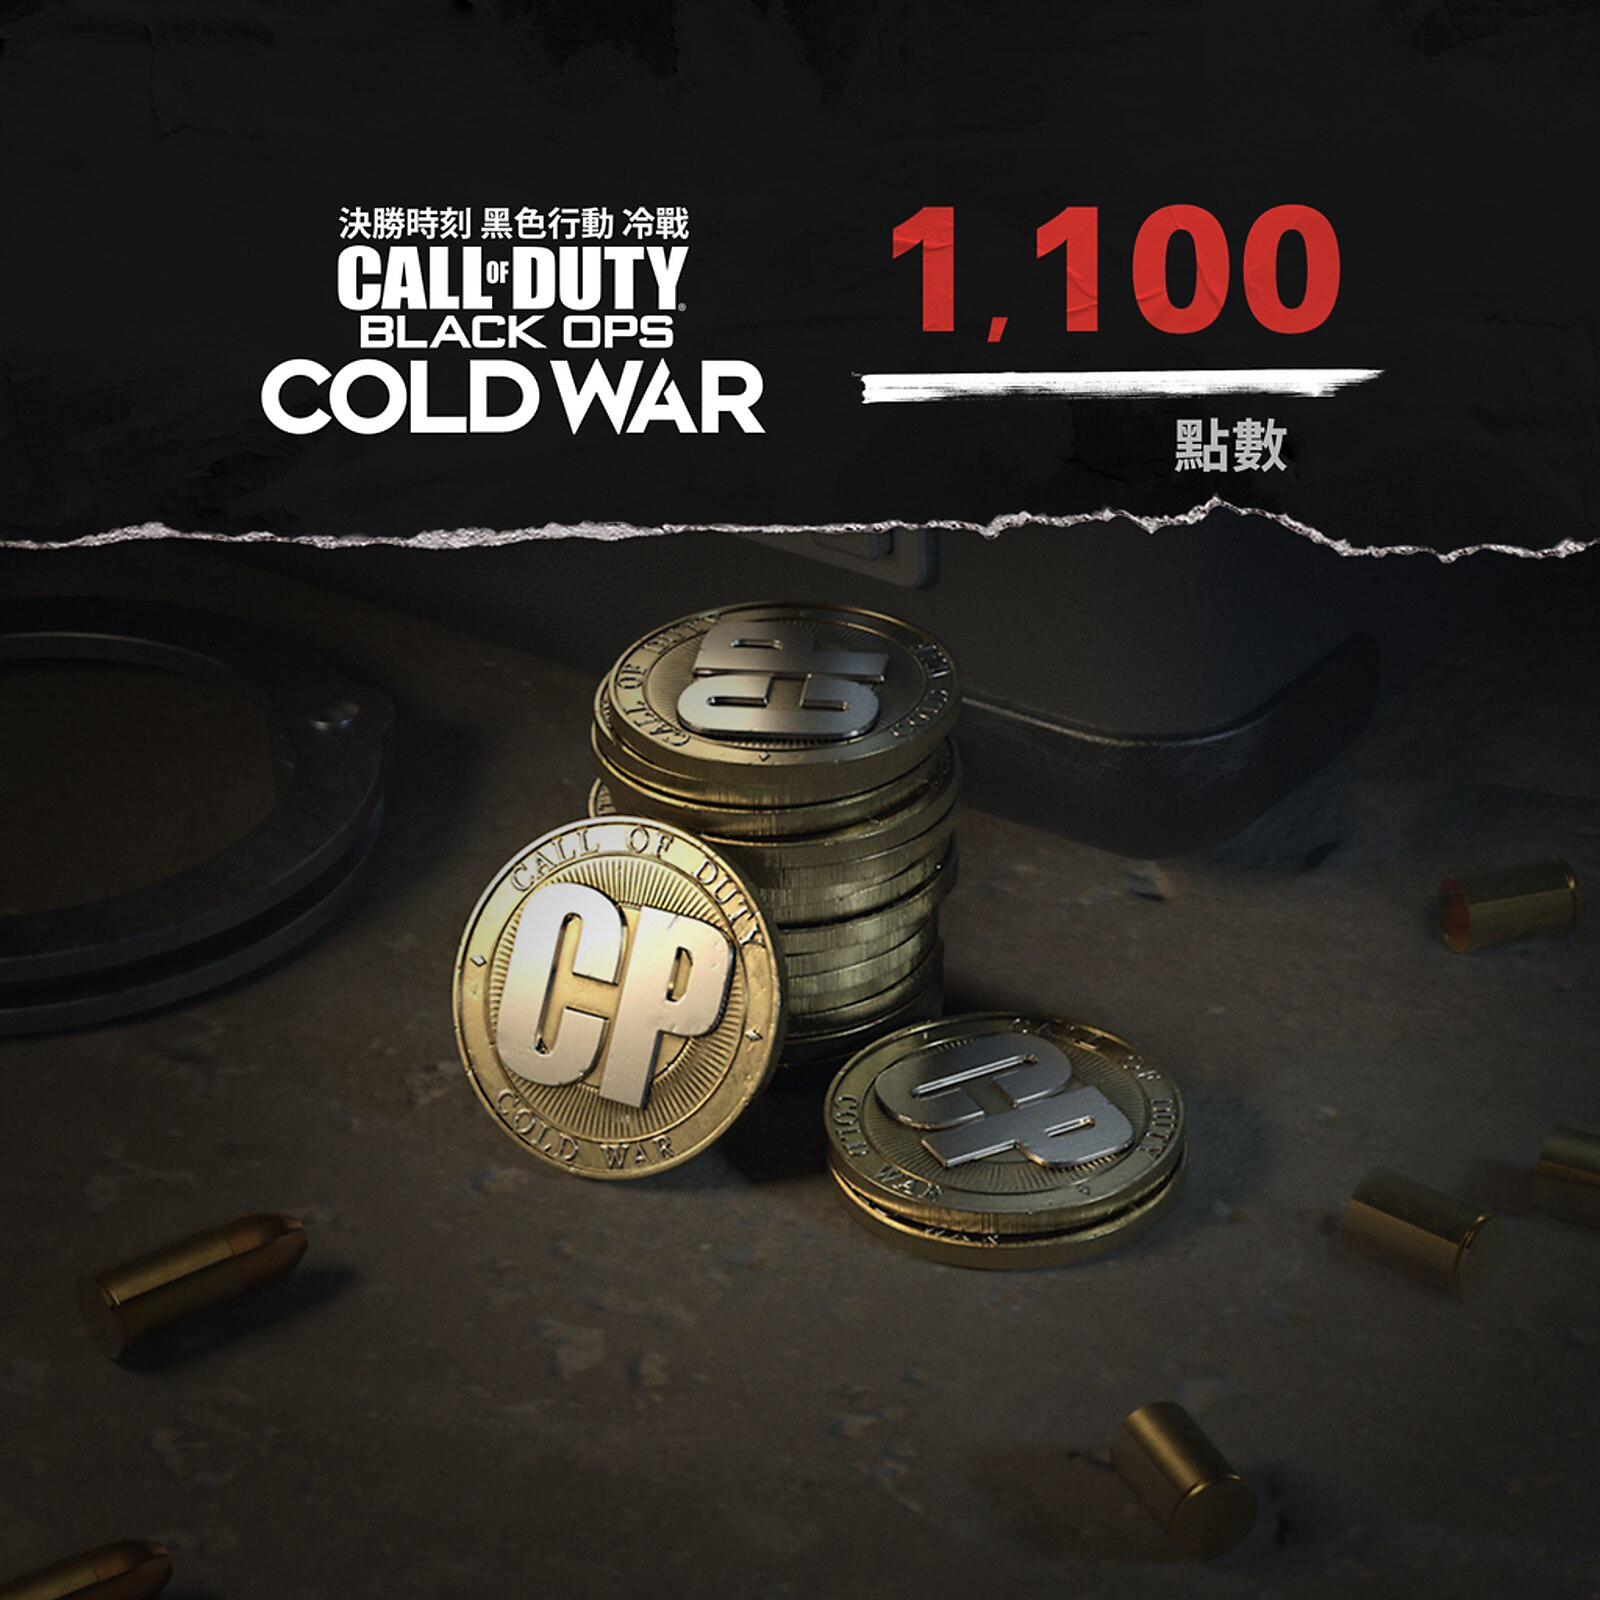 Call of Duty Black Ops Cold War points 1100 packshot